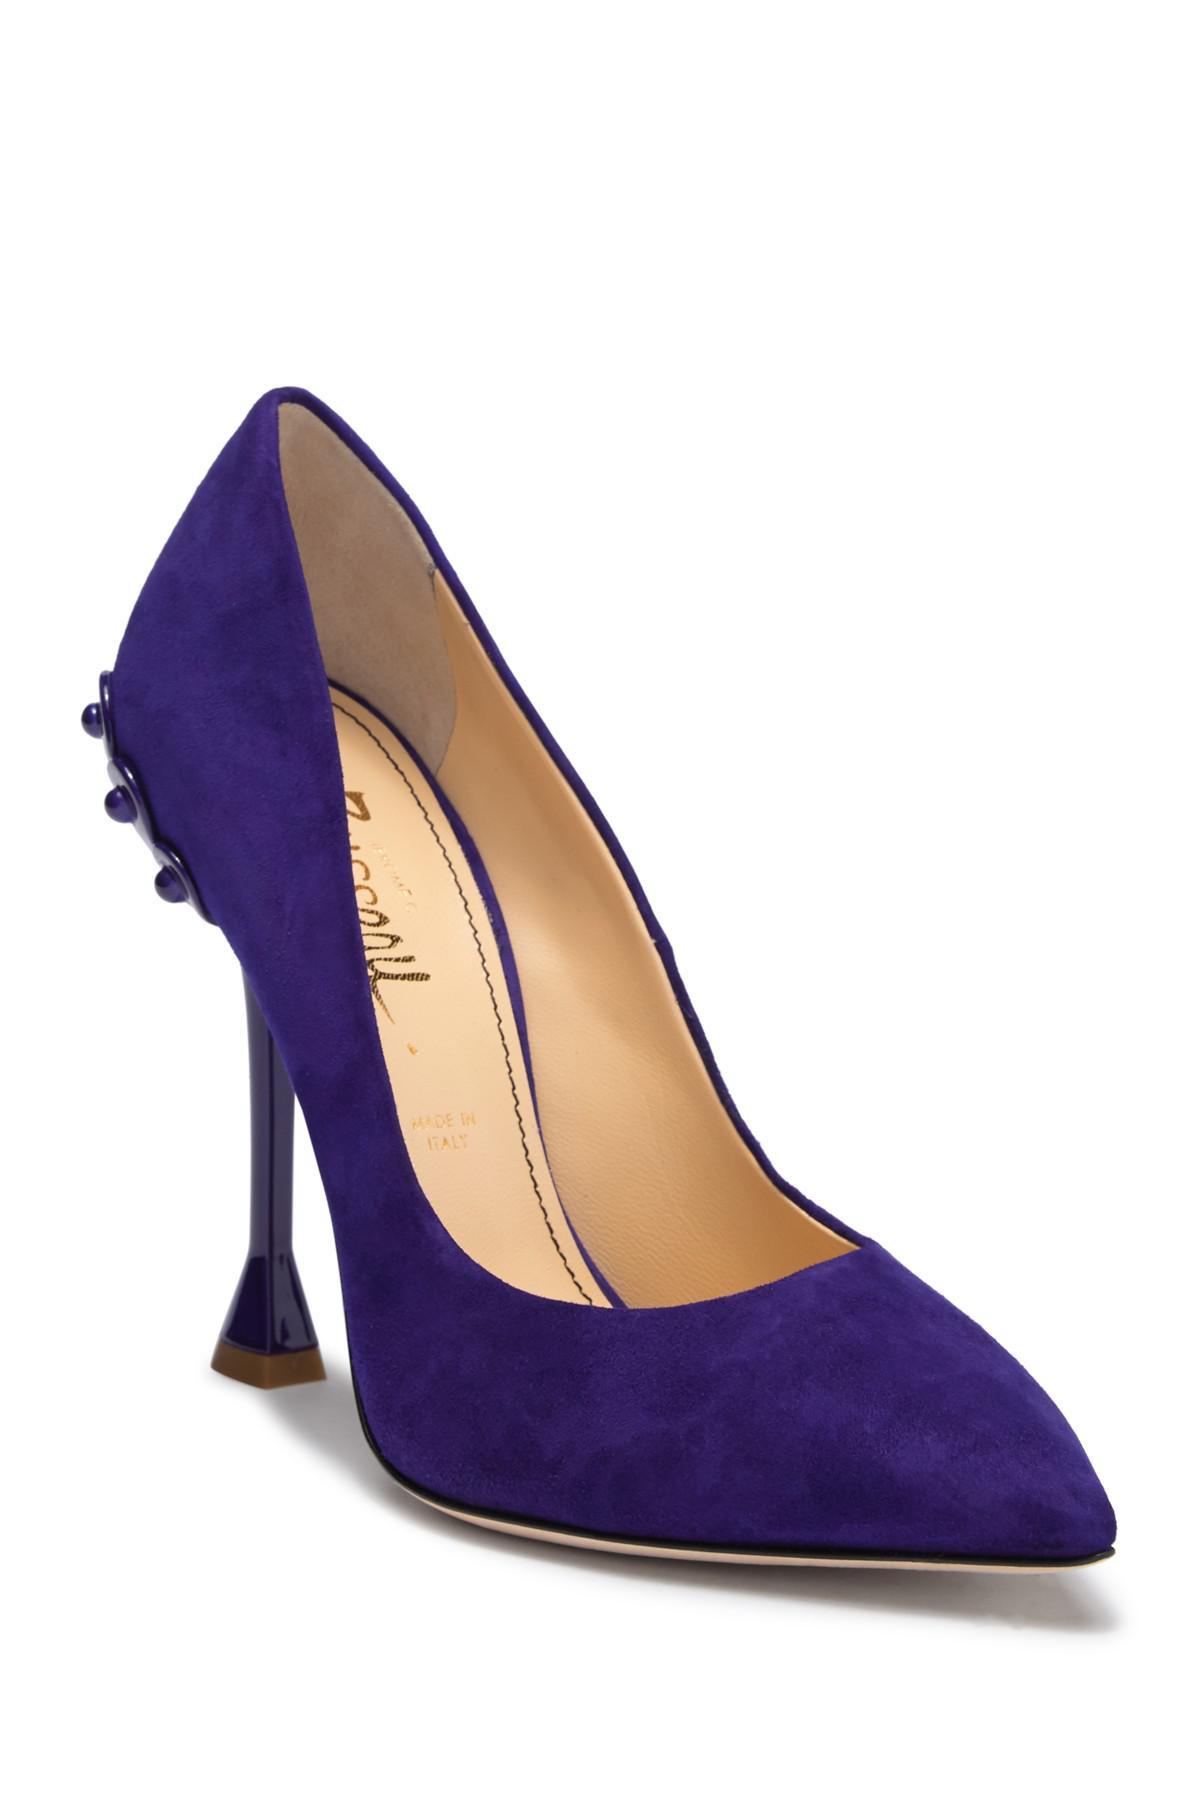 JEROME C ROUSSEAU Pulse High Heel Shoe